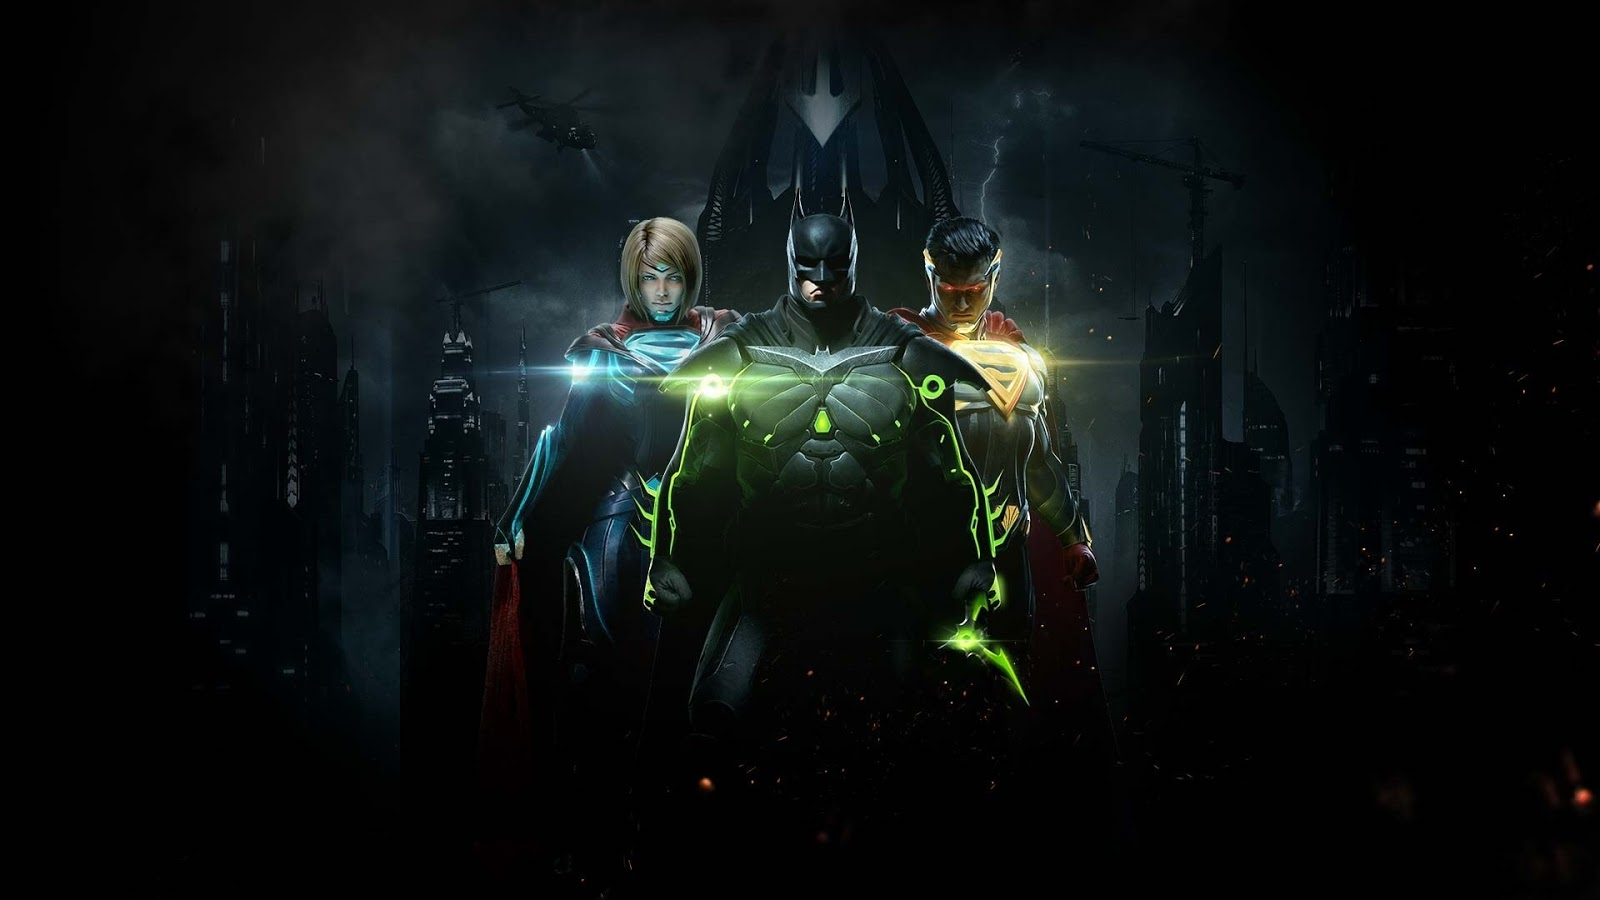 injustice 2 batman, supergirl and superman